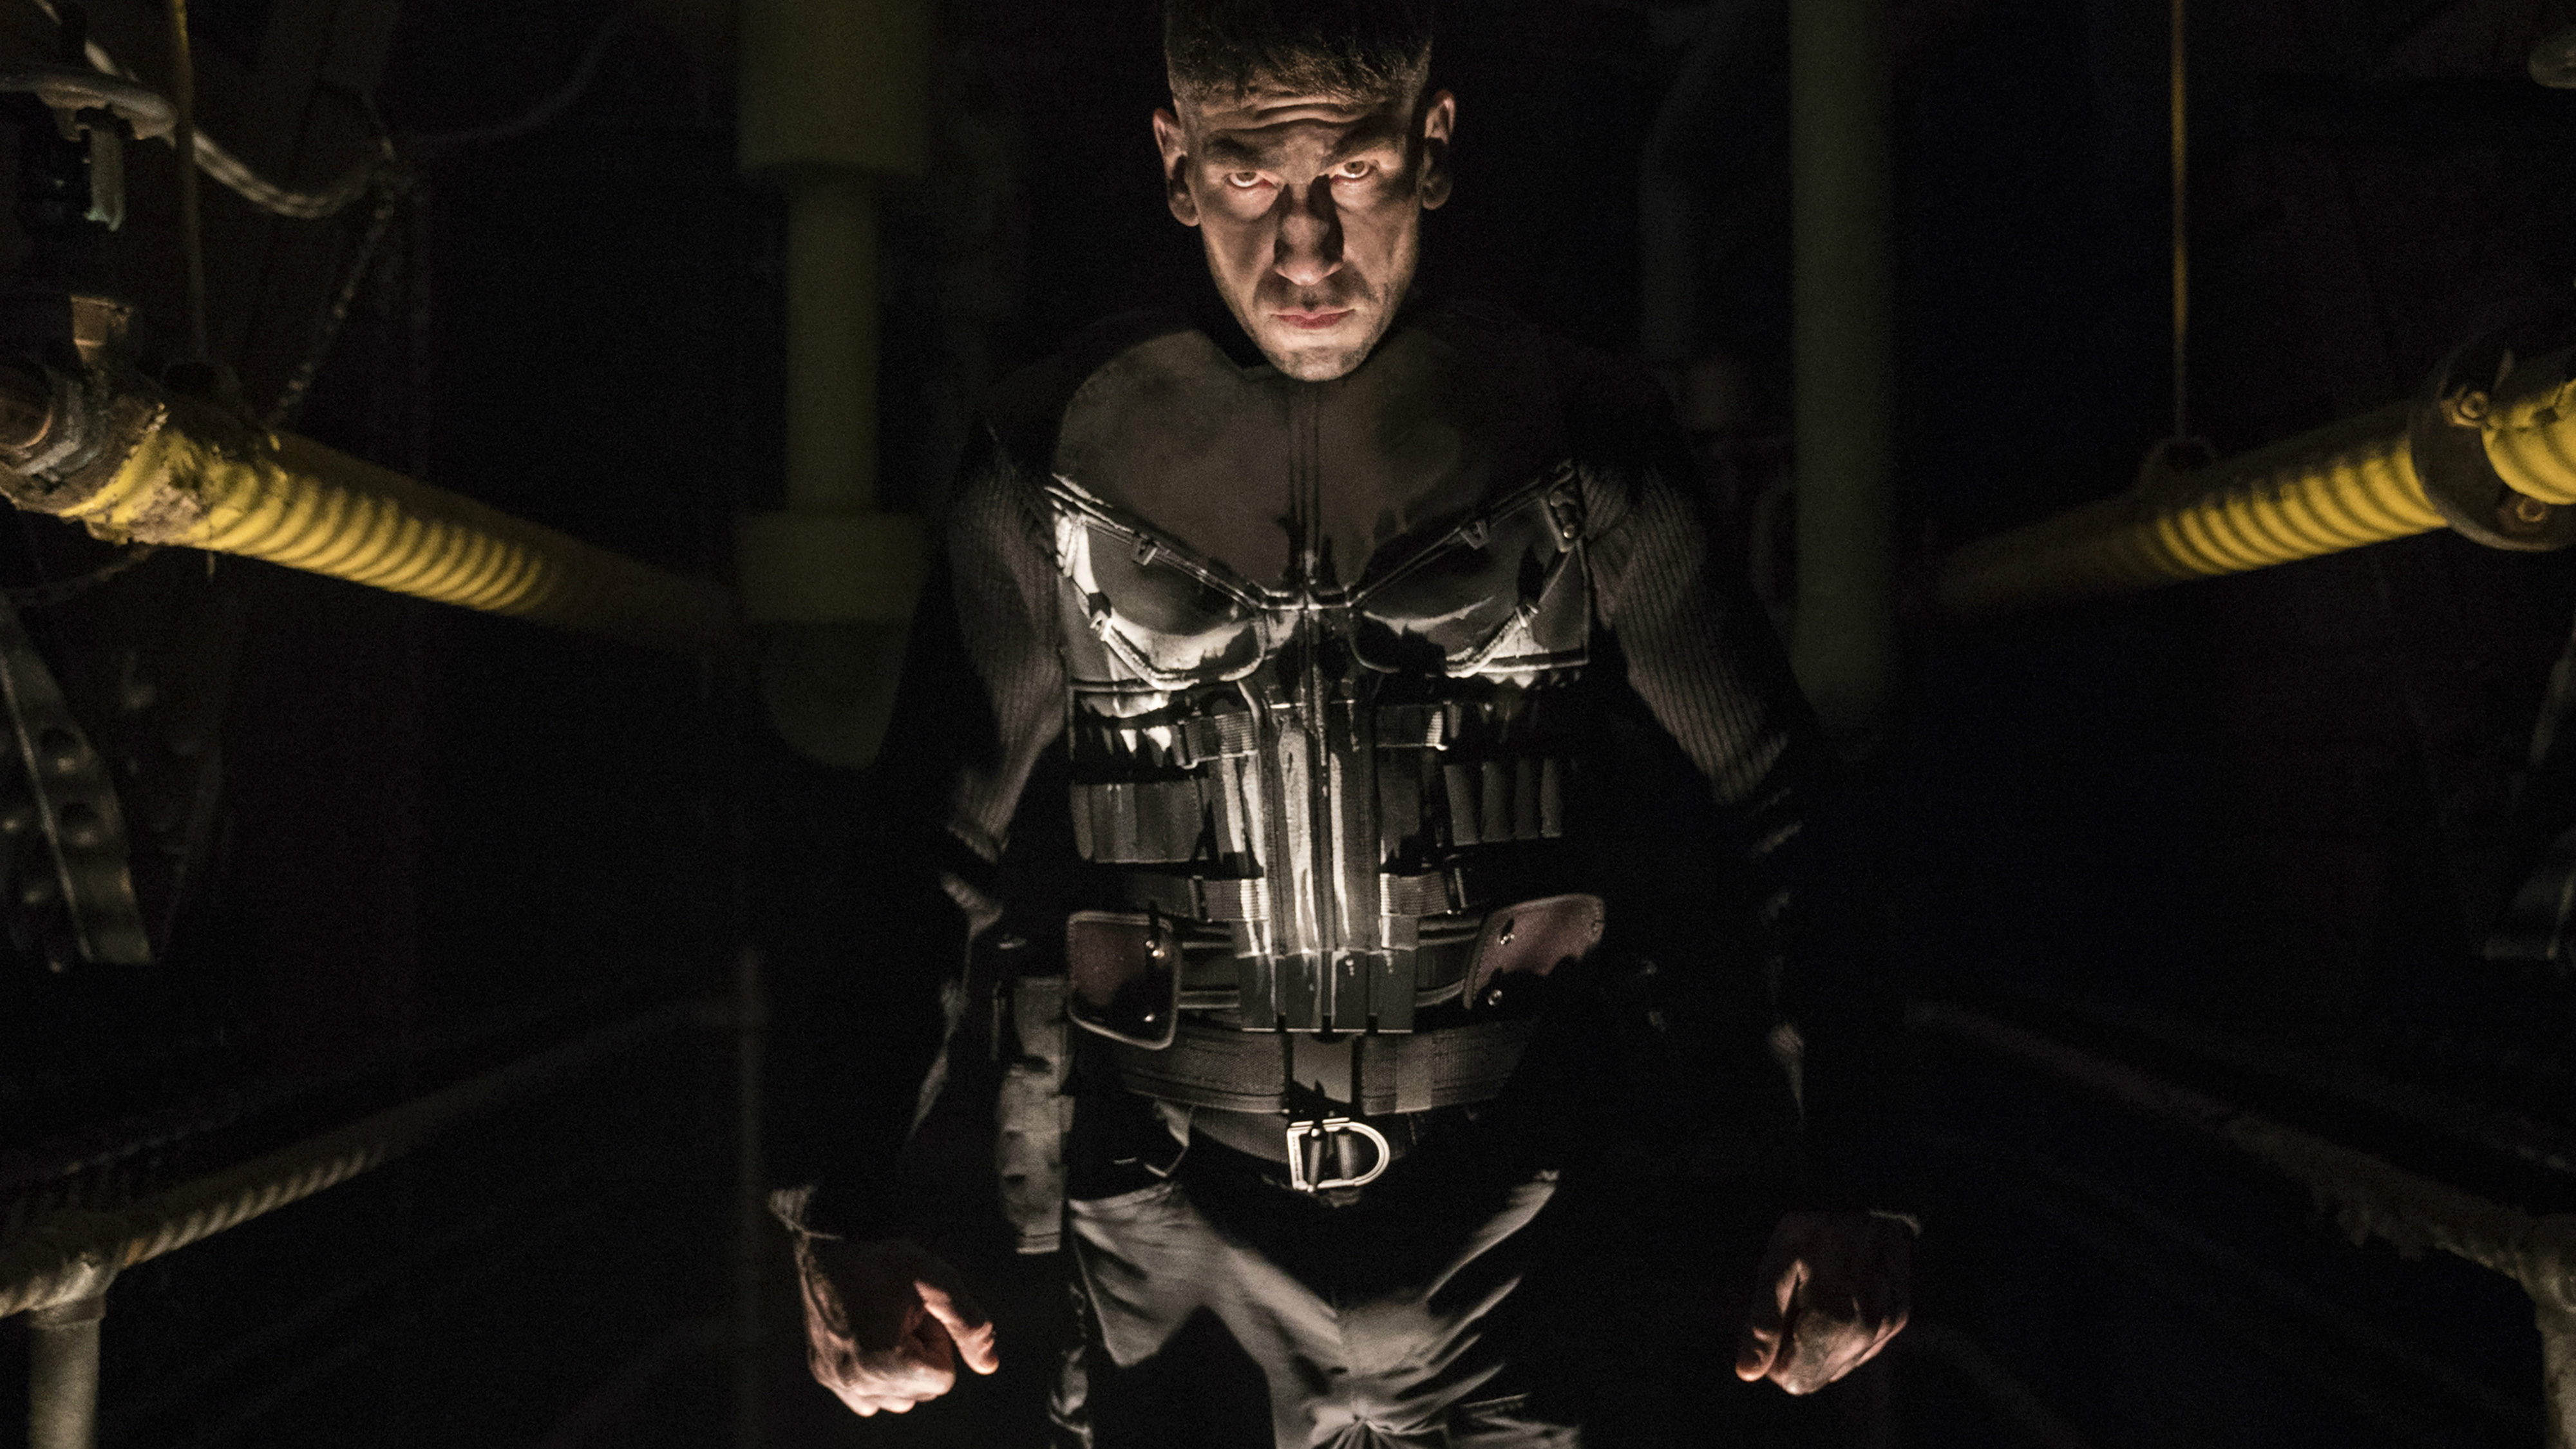 1920x1080 Jon Bernthal As Punisher Laptop Full Hd 1080p Hd 4k